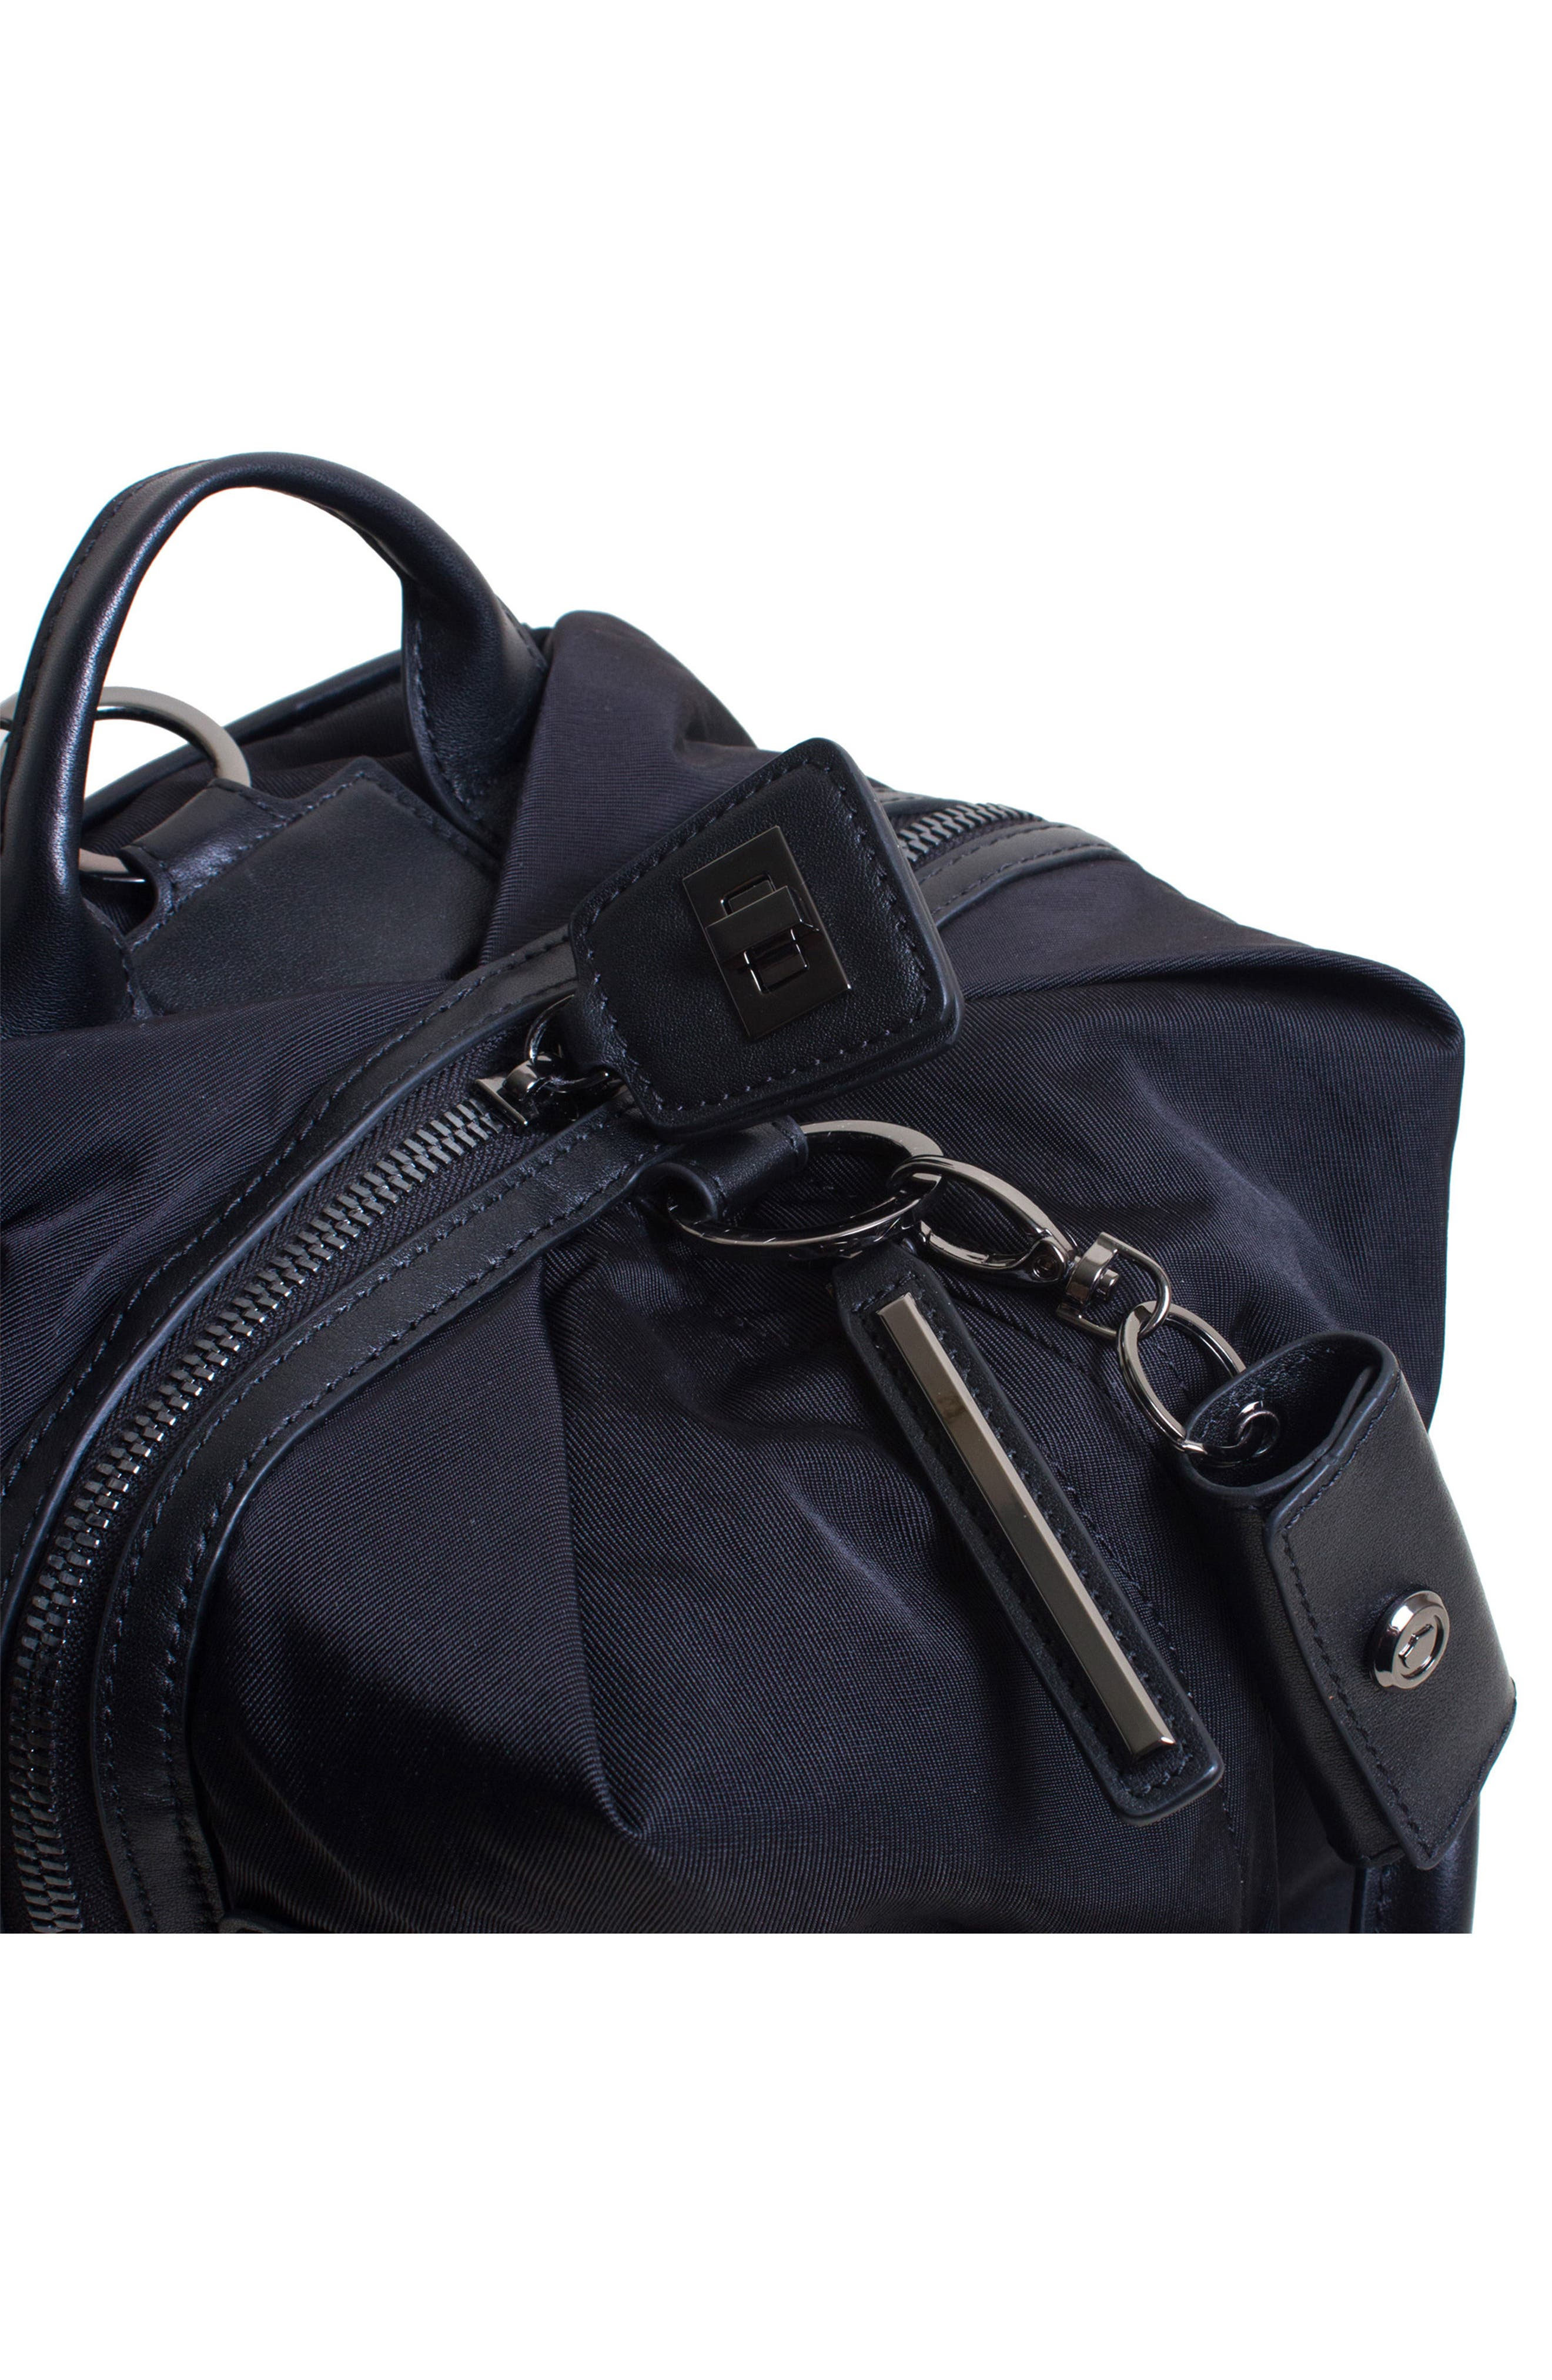 Studio Medium Duffel Backpack,                             Alternate thumbnail 6, color,                             BLACK